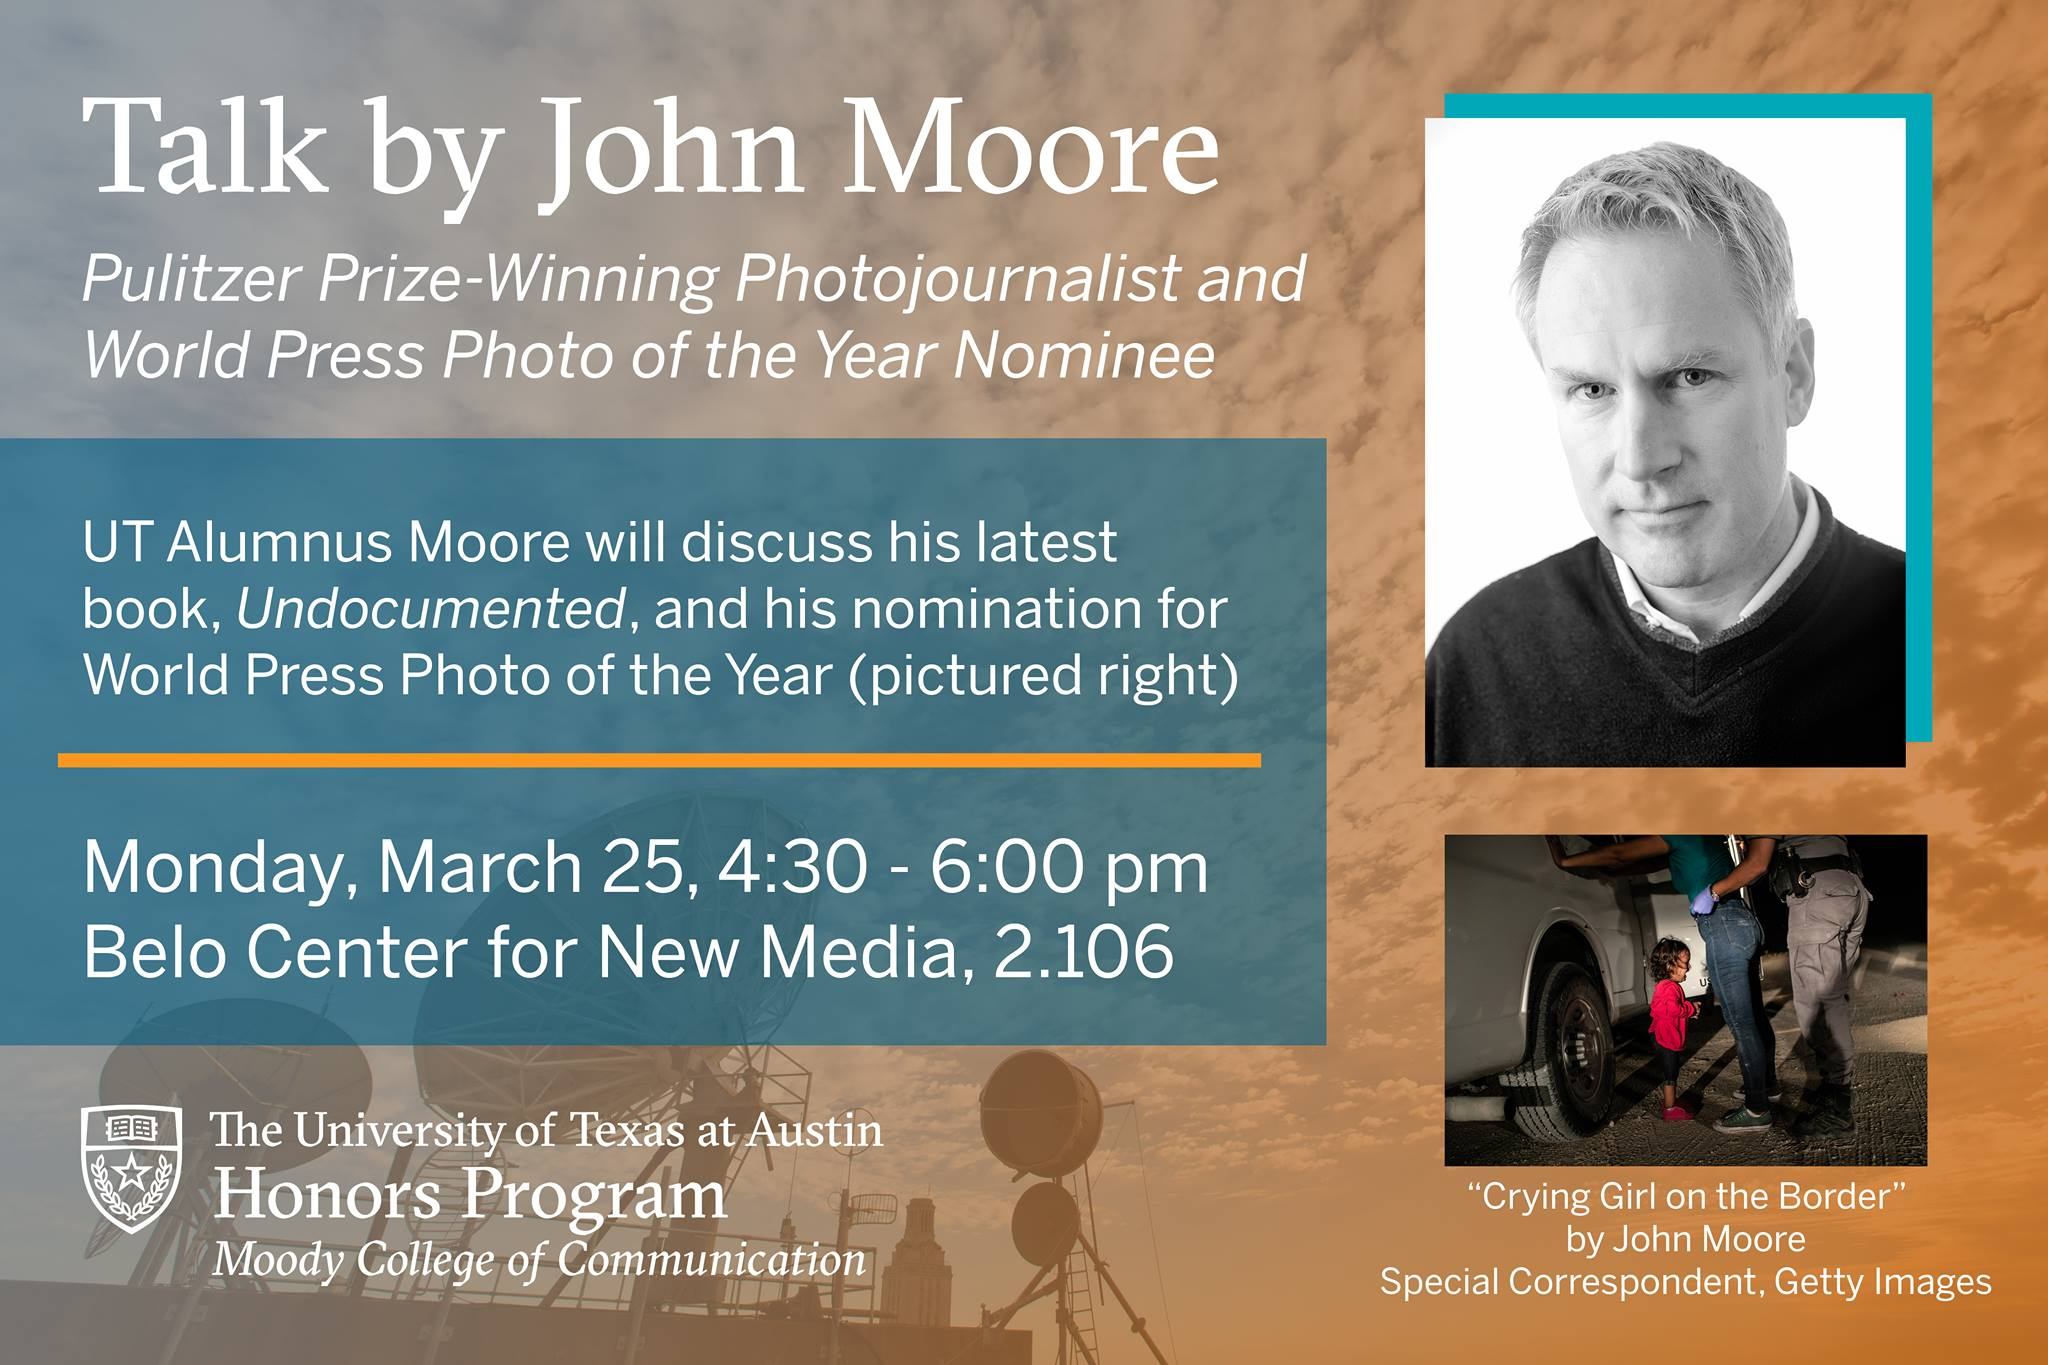 John Moore event